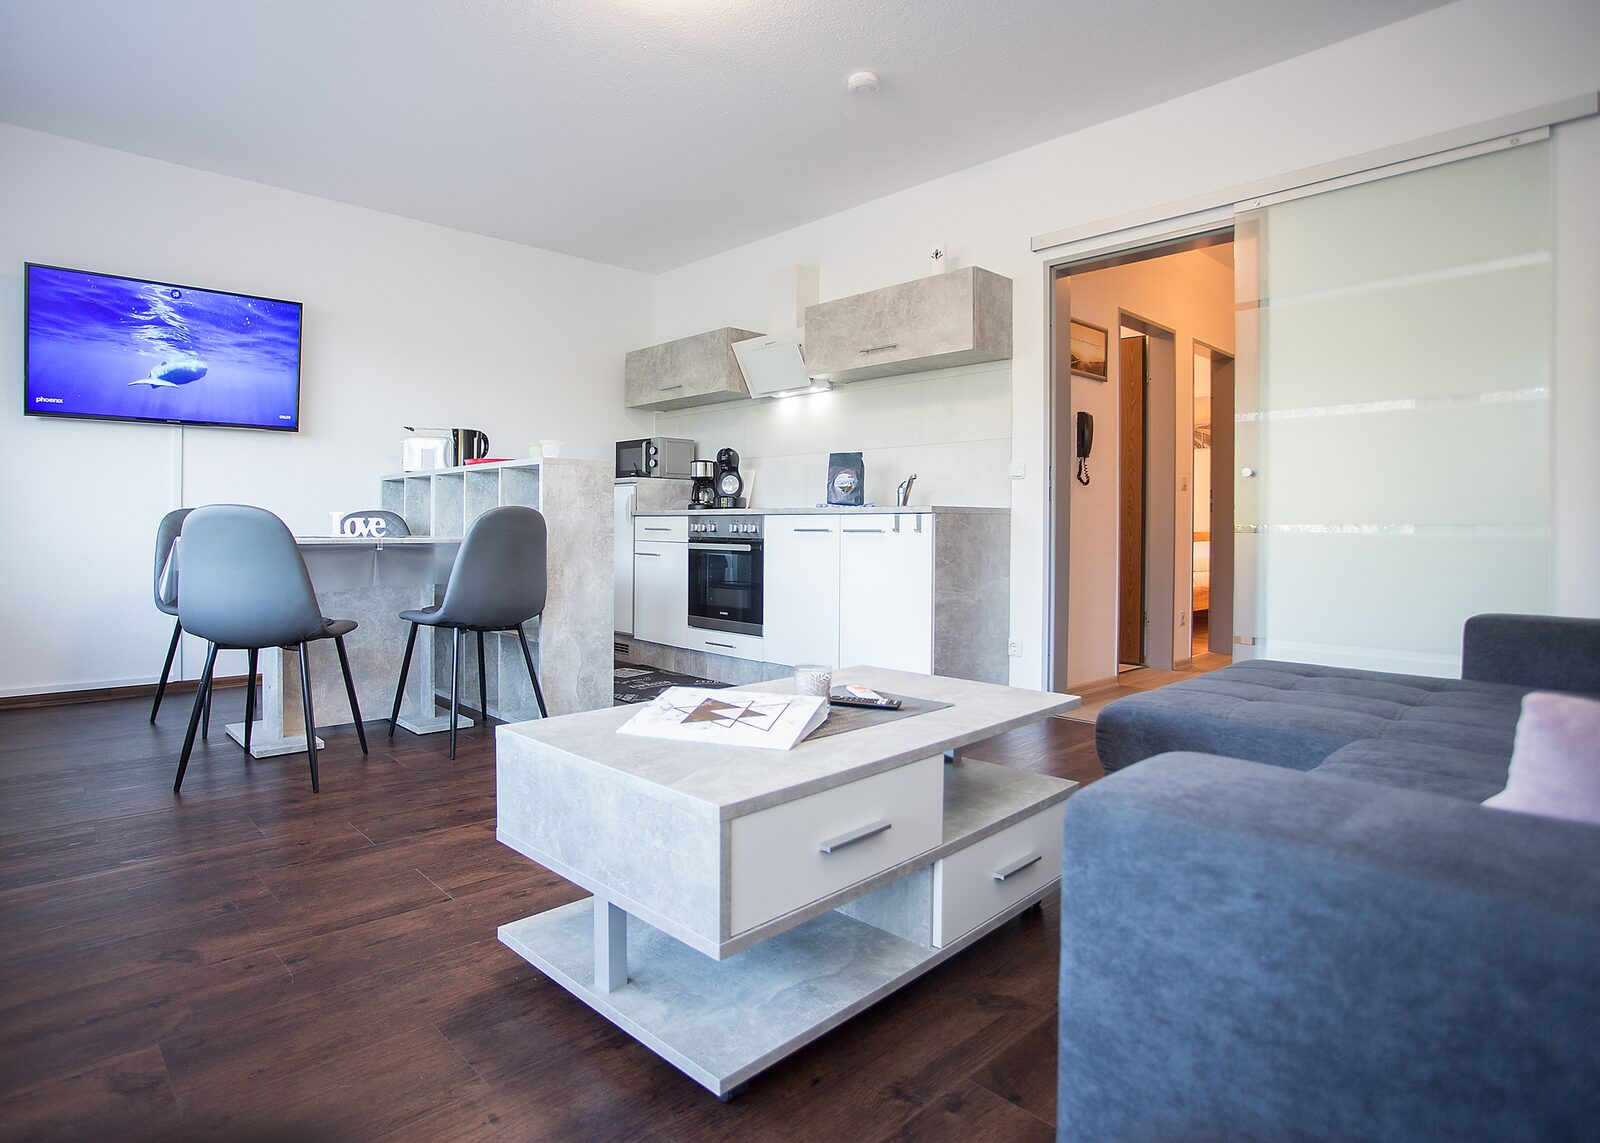 Appartement - Wacholderweg 16 | Niedersfeld (Winterberg)